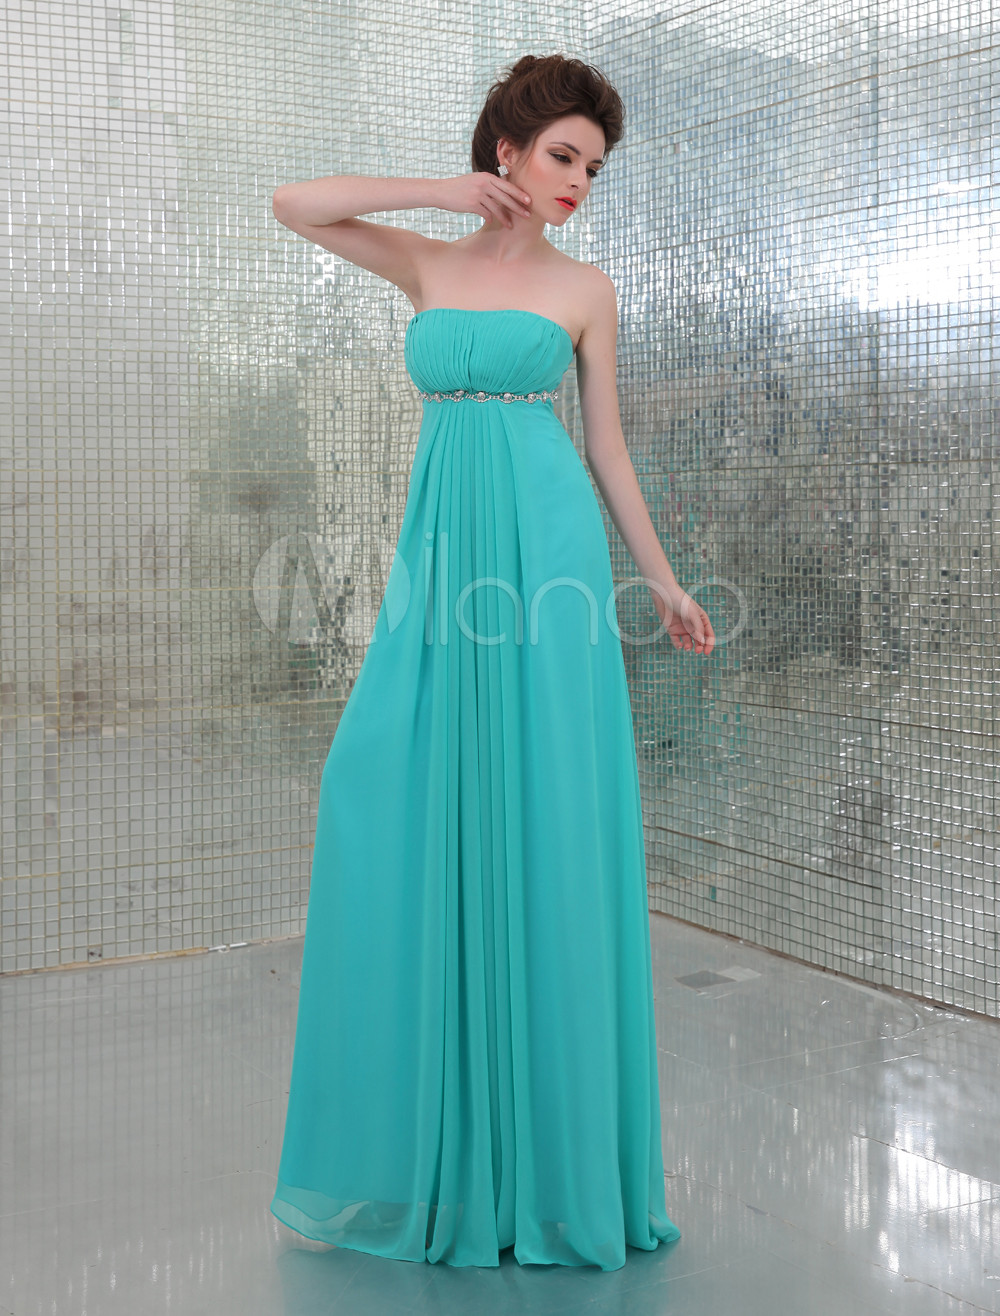 Green Strapless A-line Beading Chiffon Elegant Evening Dress (Wedding) photo